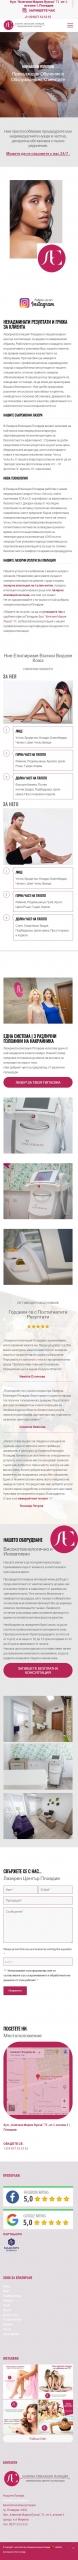 Реклама за Apps, Mobile-LazernaEpilaciaPlovdiv-CherryDesign